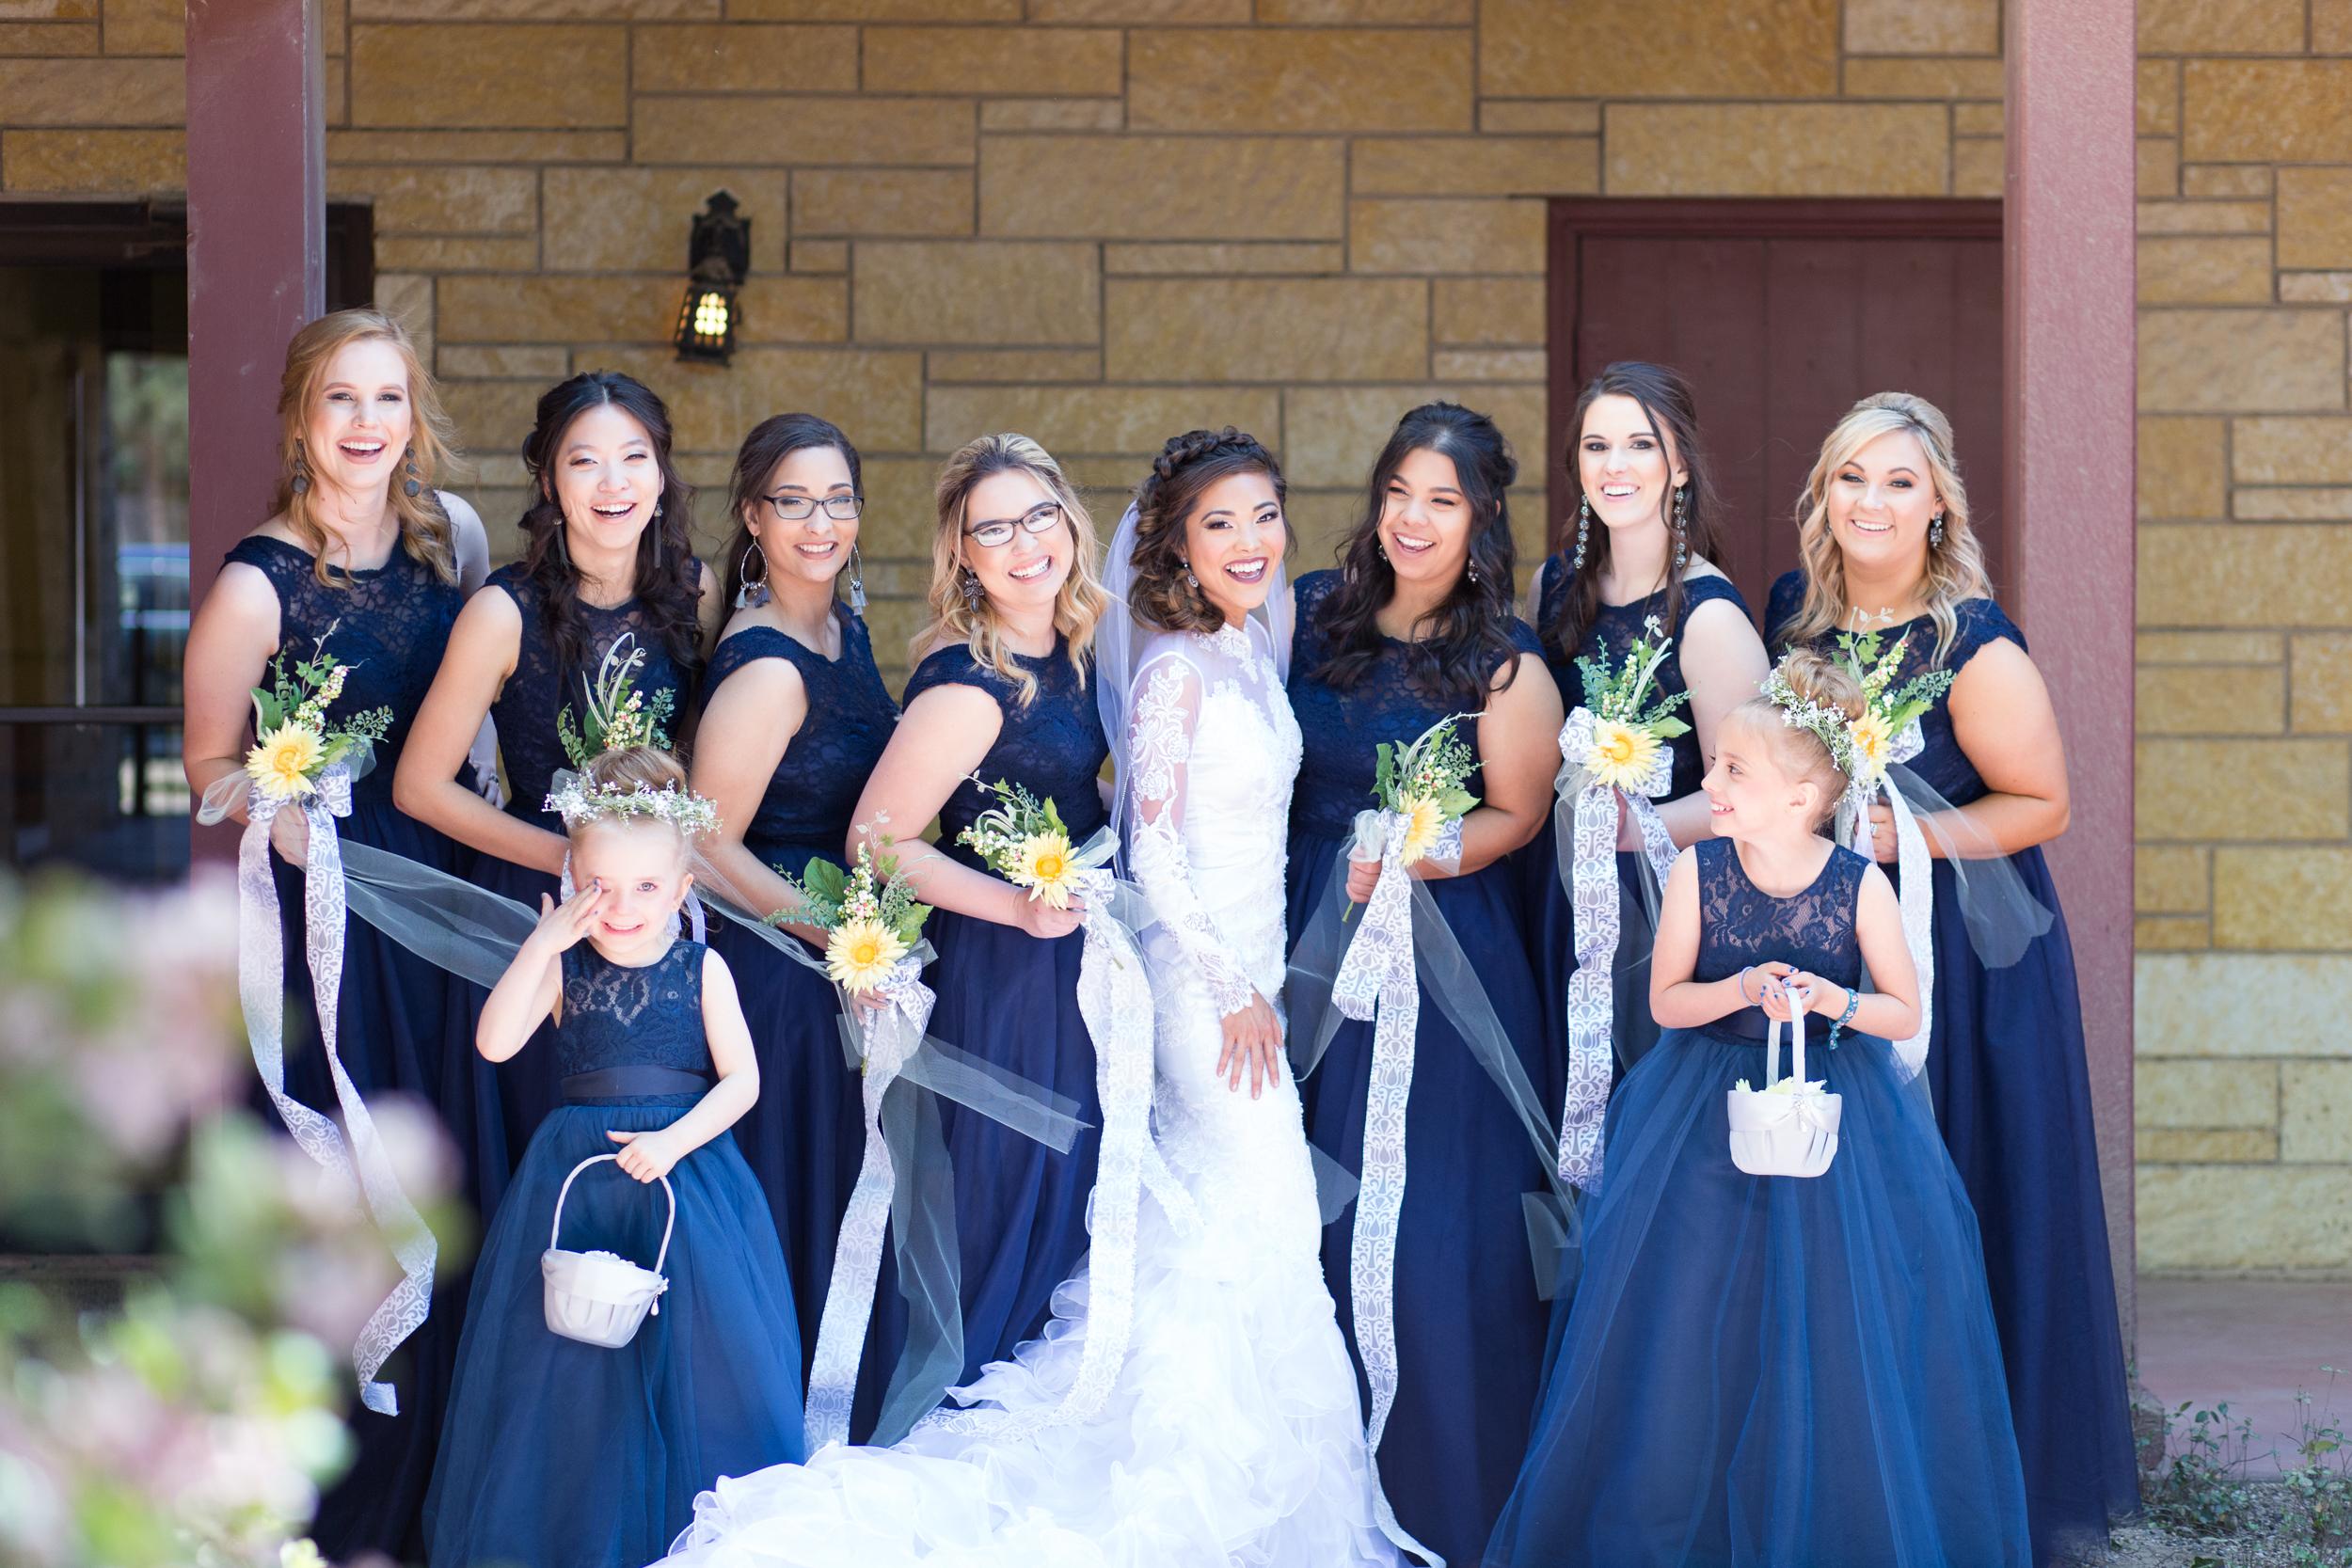 hall_wedding blog_kelsie hendricks photography_odessa_ west texas-32.jpg